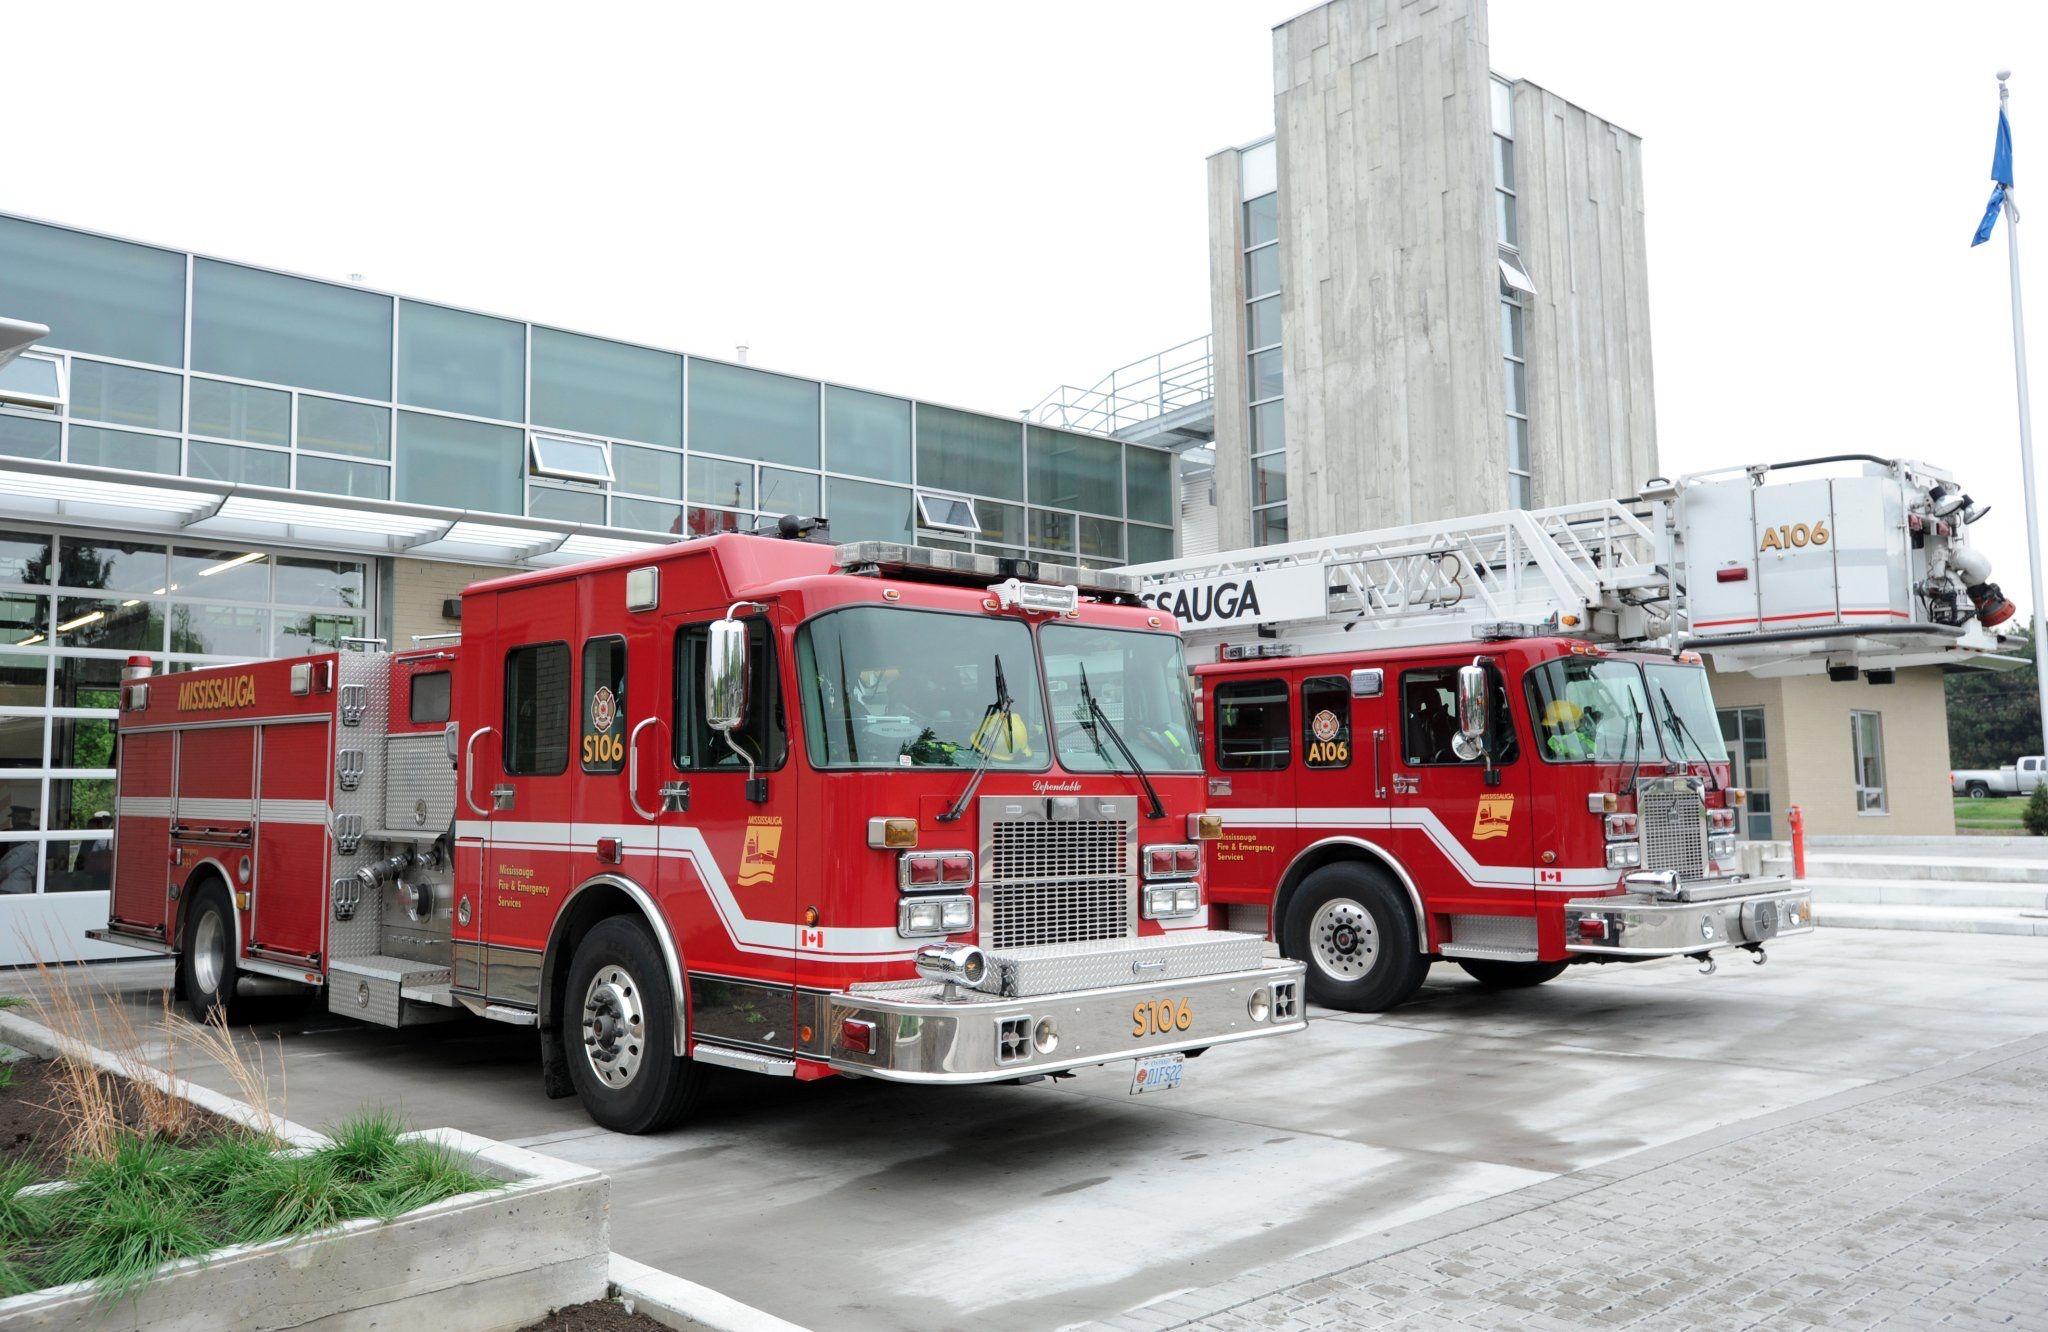 Mississauga Fire Dept Ontario Ca Fire Trucks Emergency Vehicles Fire Dept